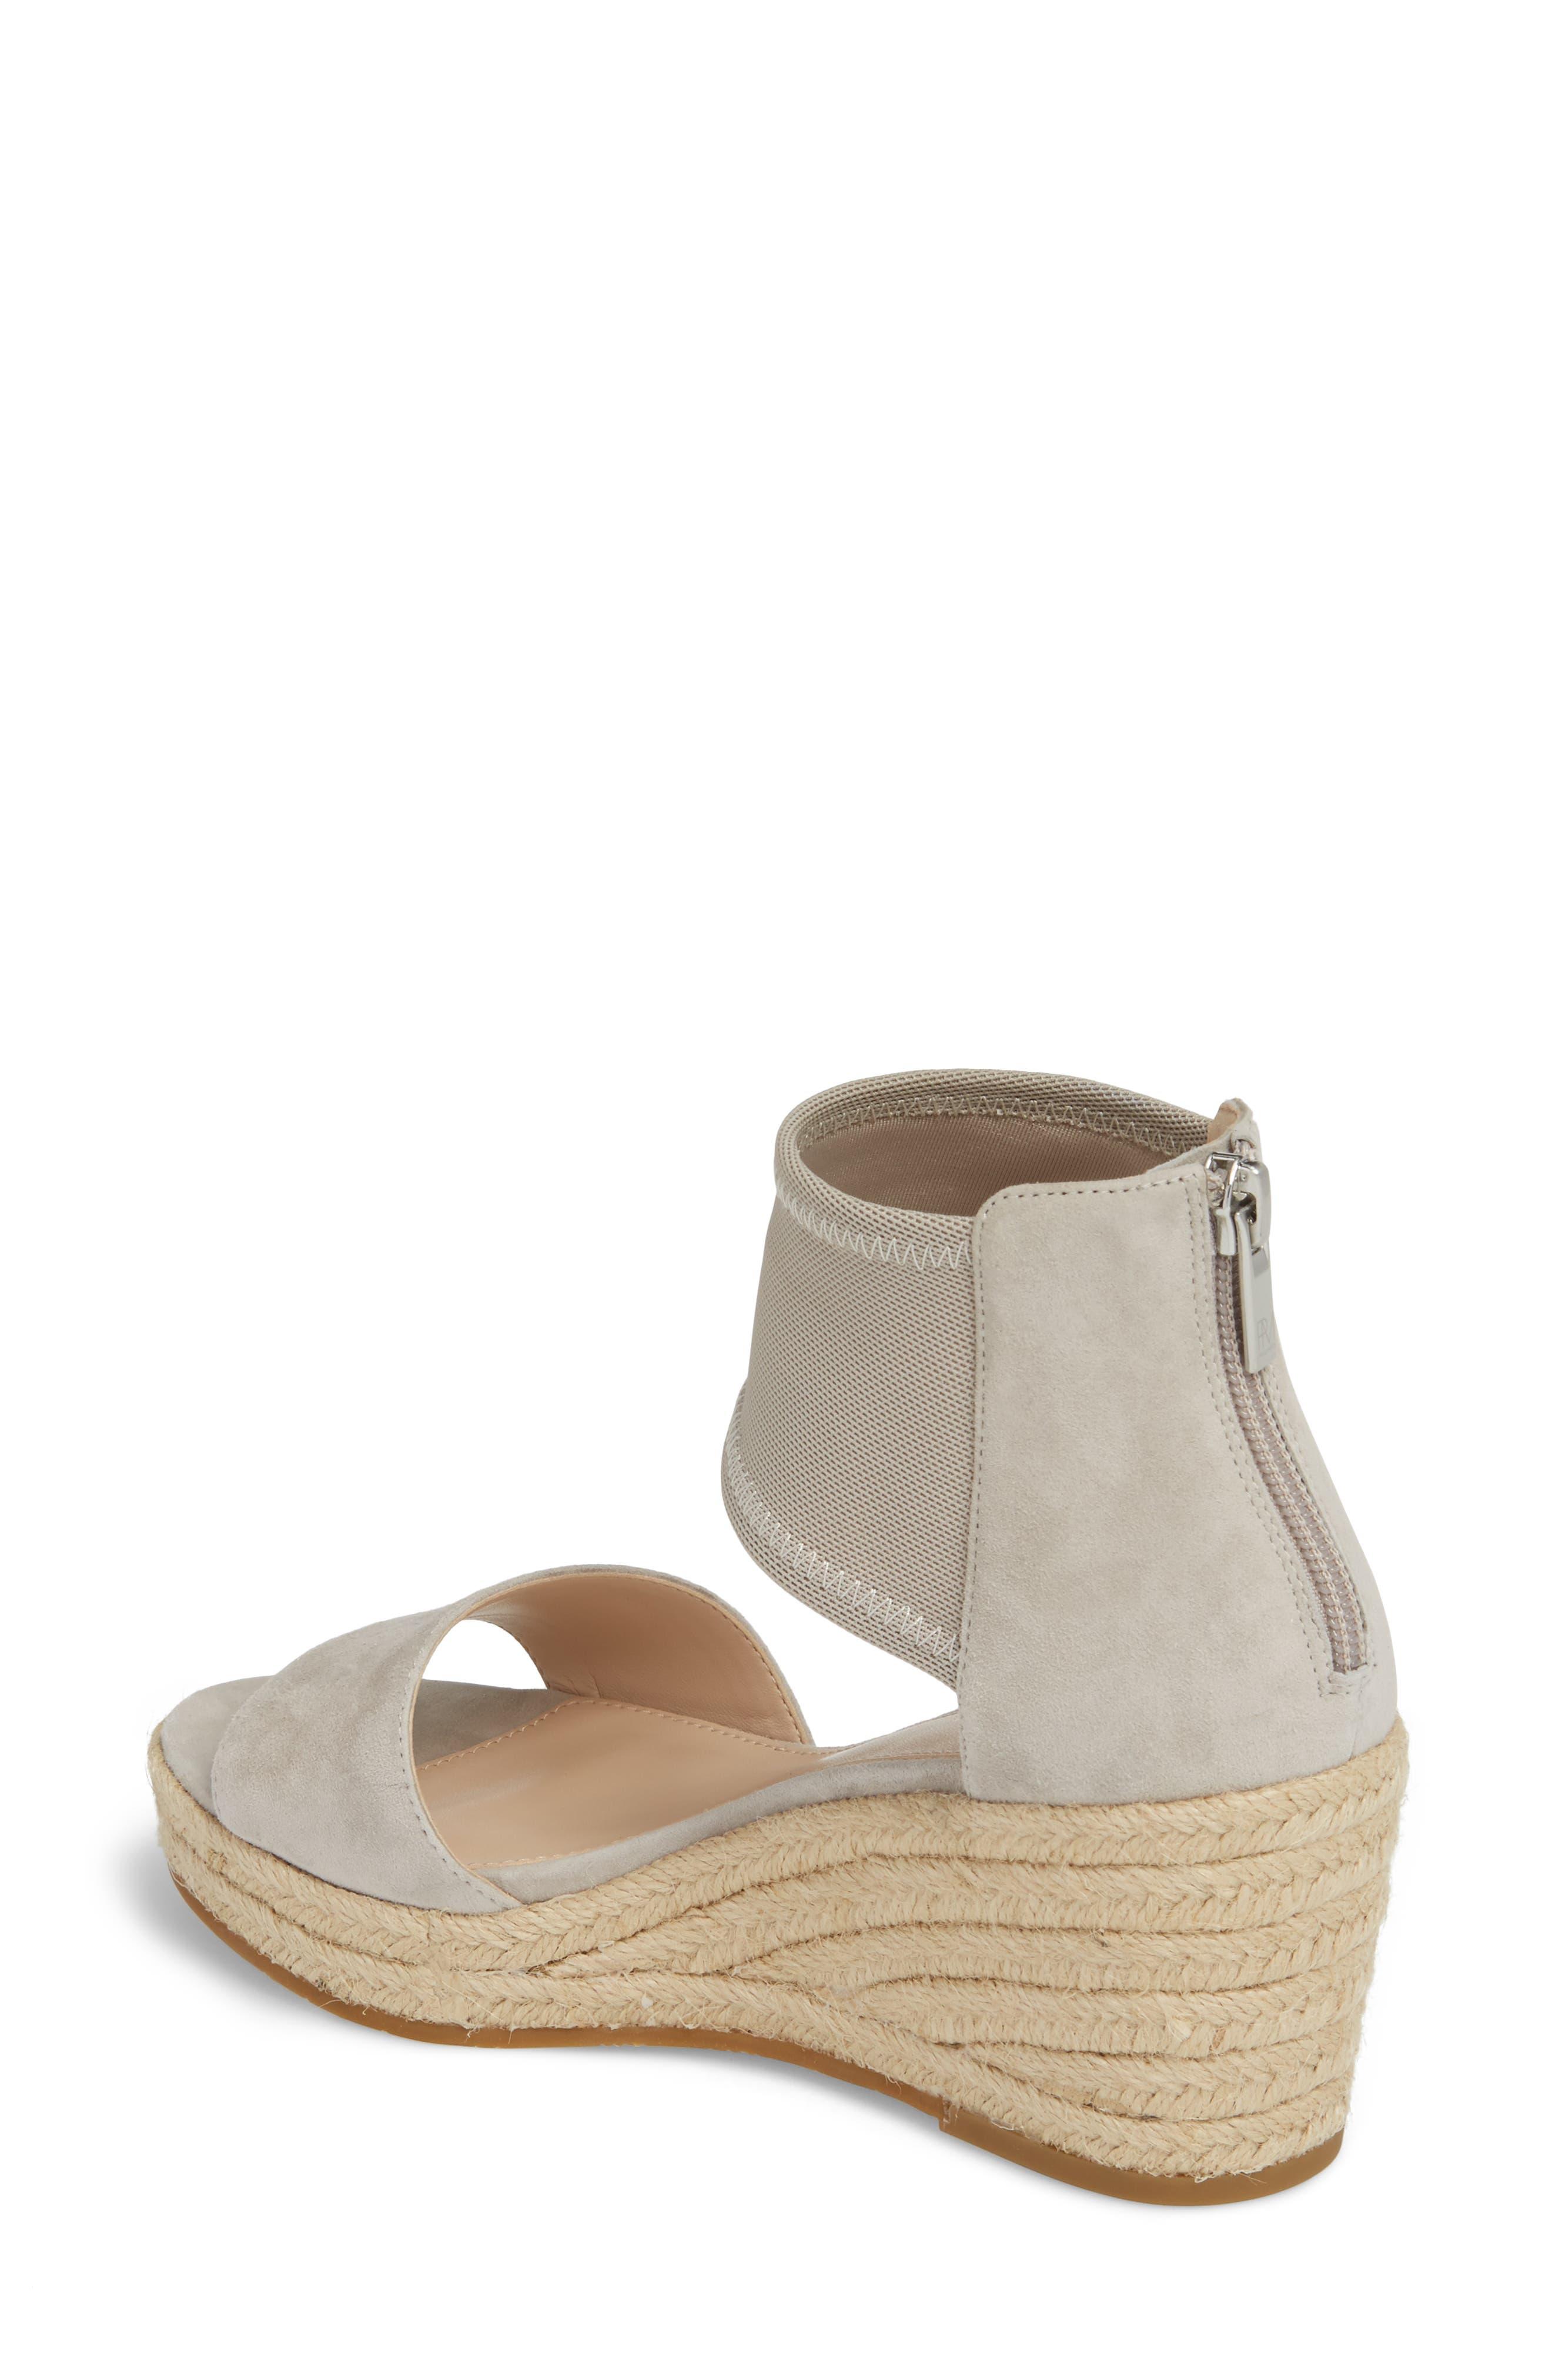 Kona Platform Wedge Sandal,                             Alternate thumbnail 2, color,                             CLOUD SUEDE